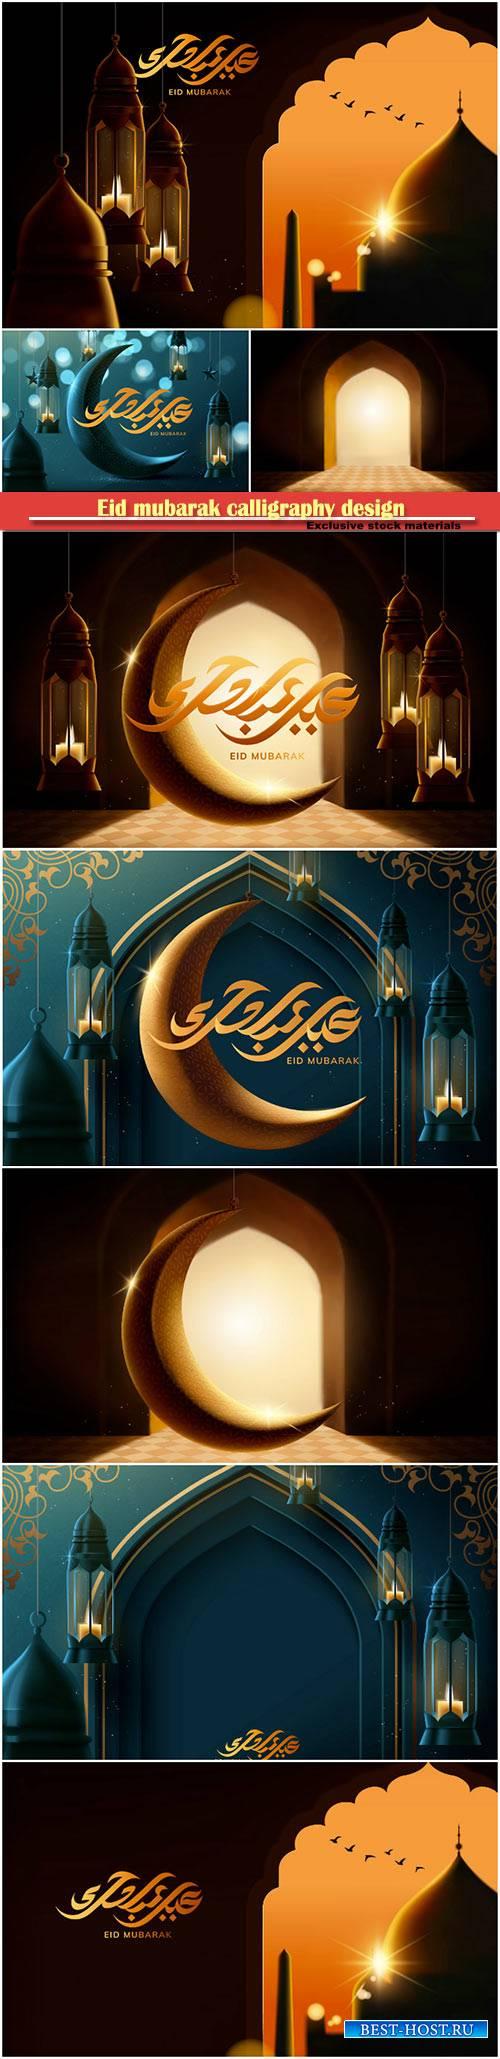 Eid mubarak calligraphy design, happy holiday written in Arabic